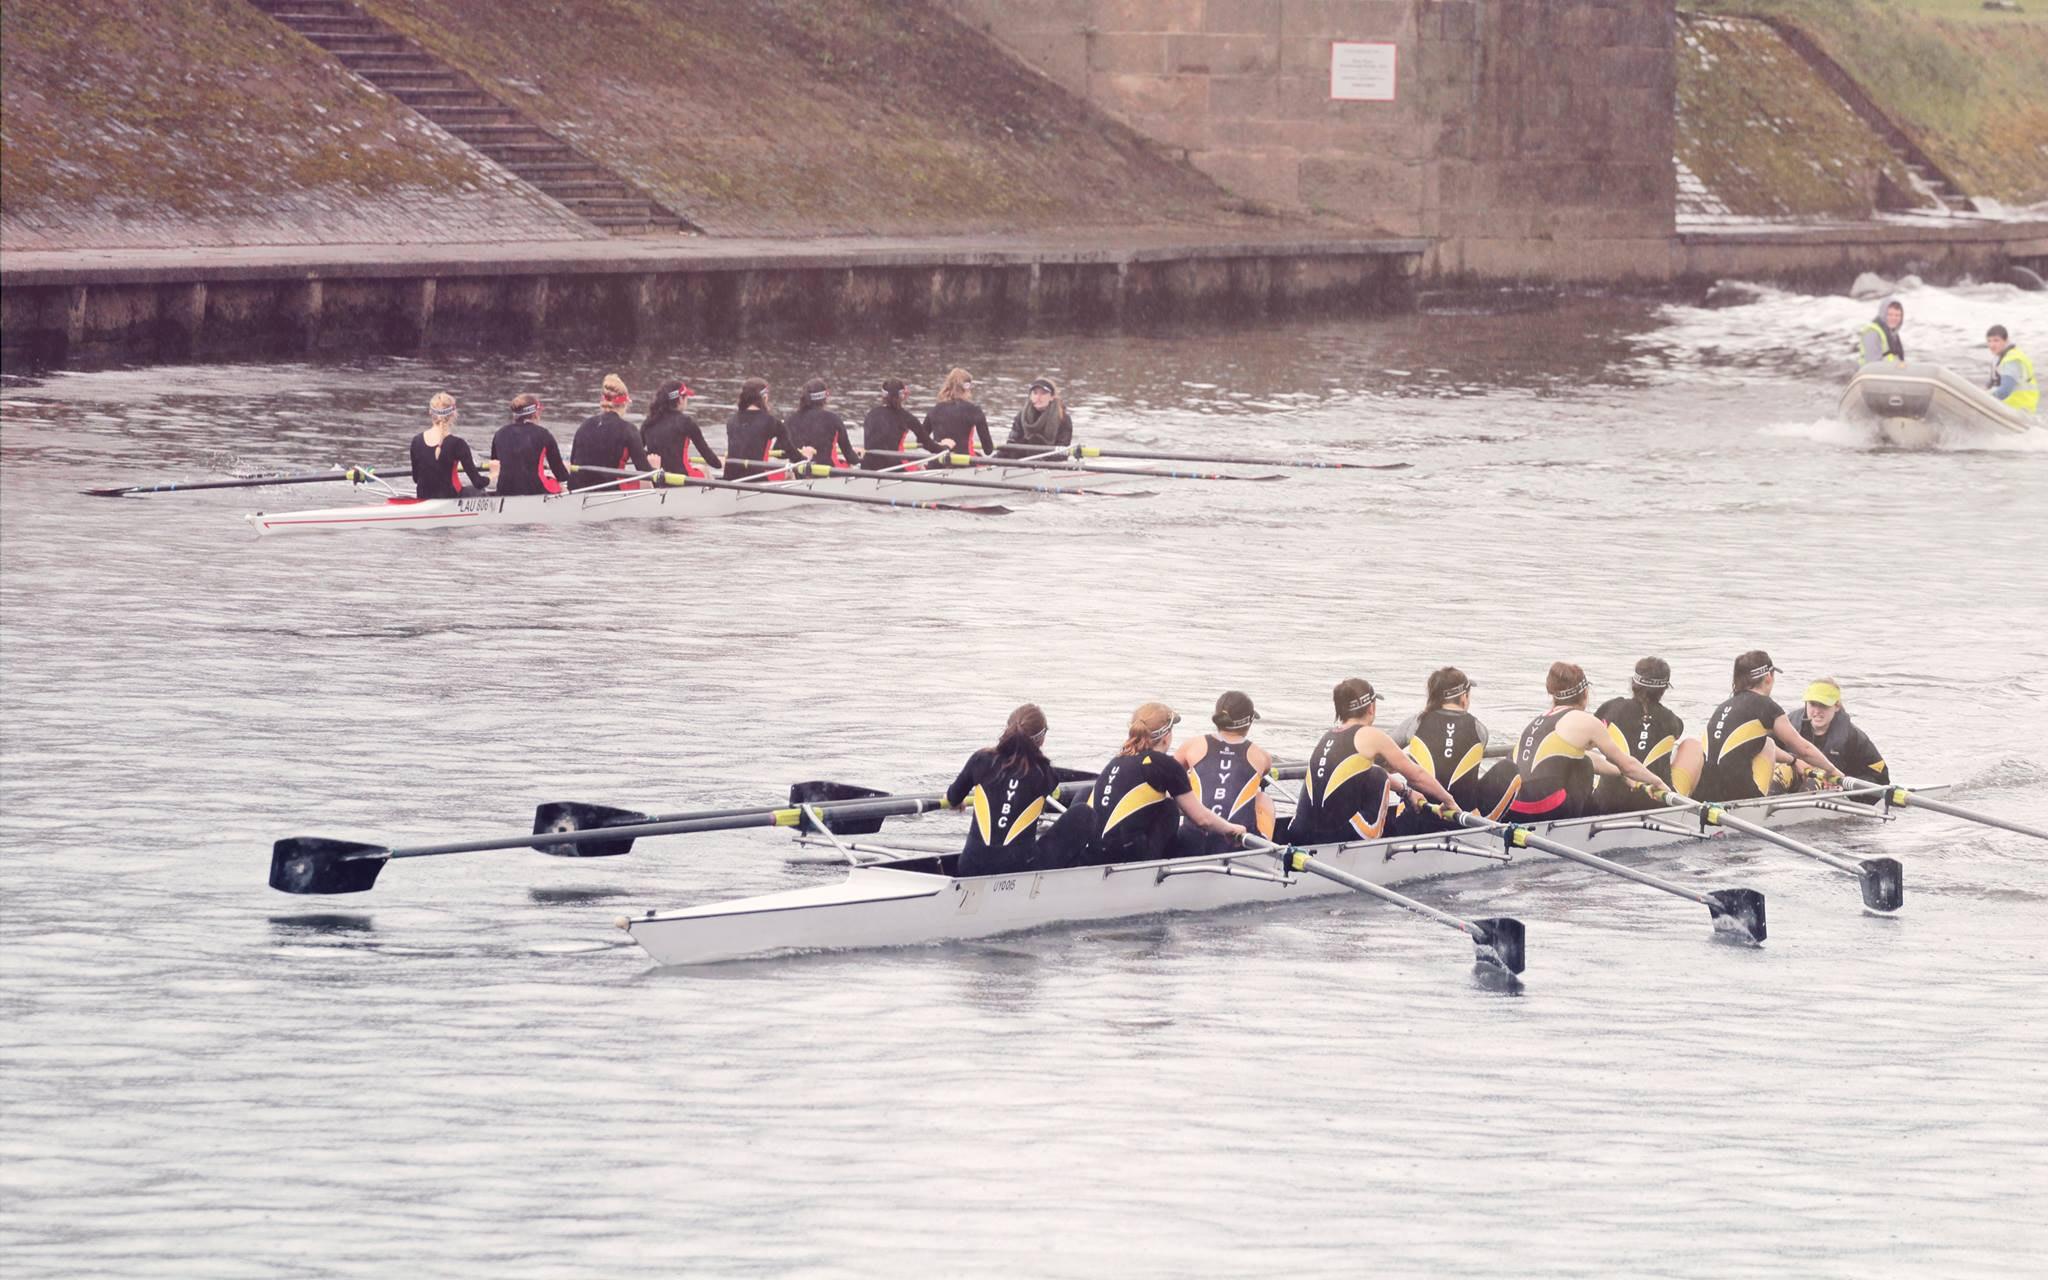 UYBC rowers do a marathon